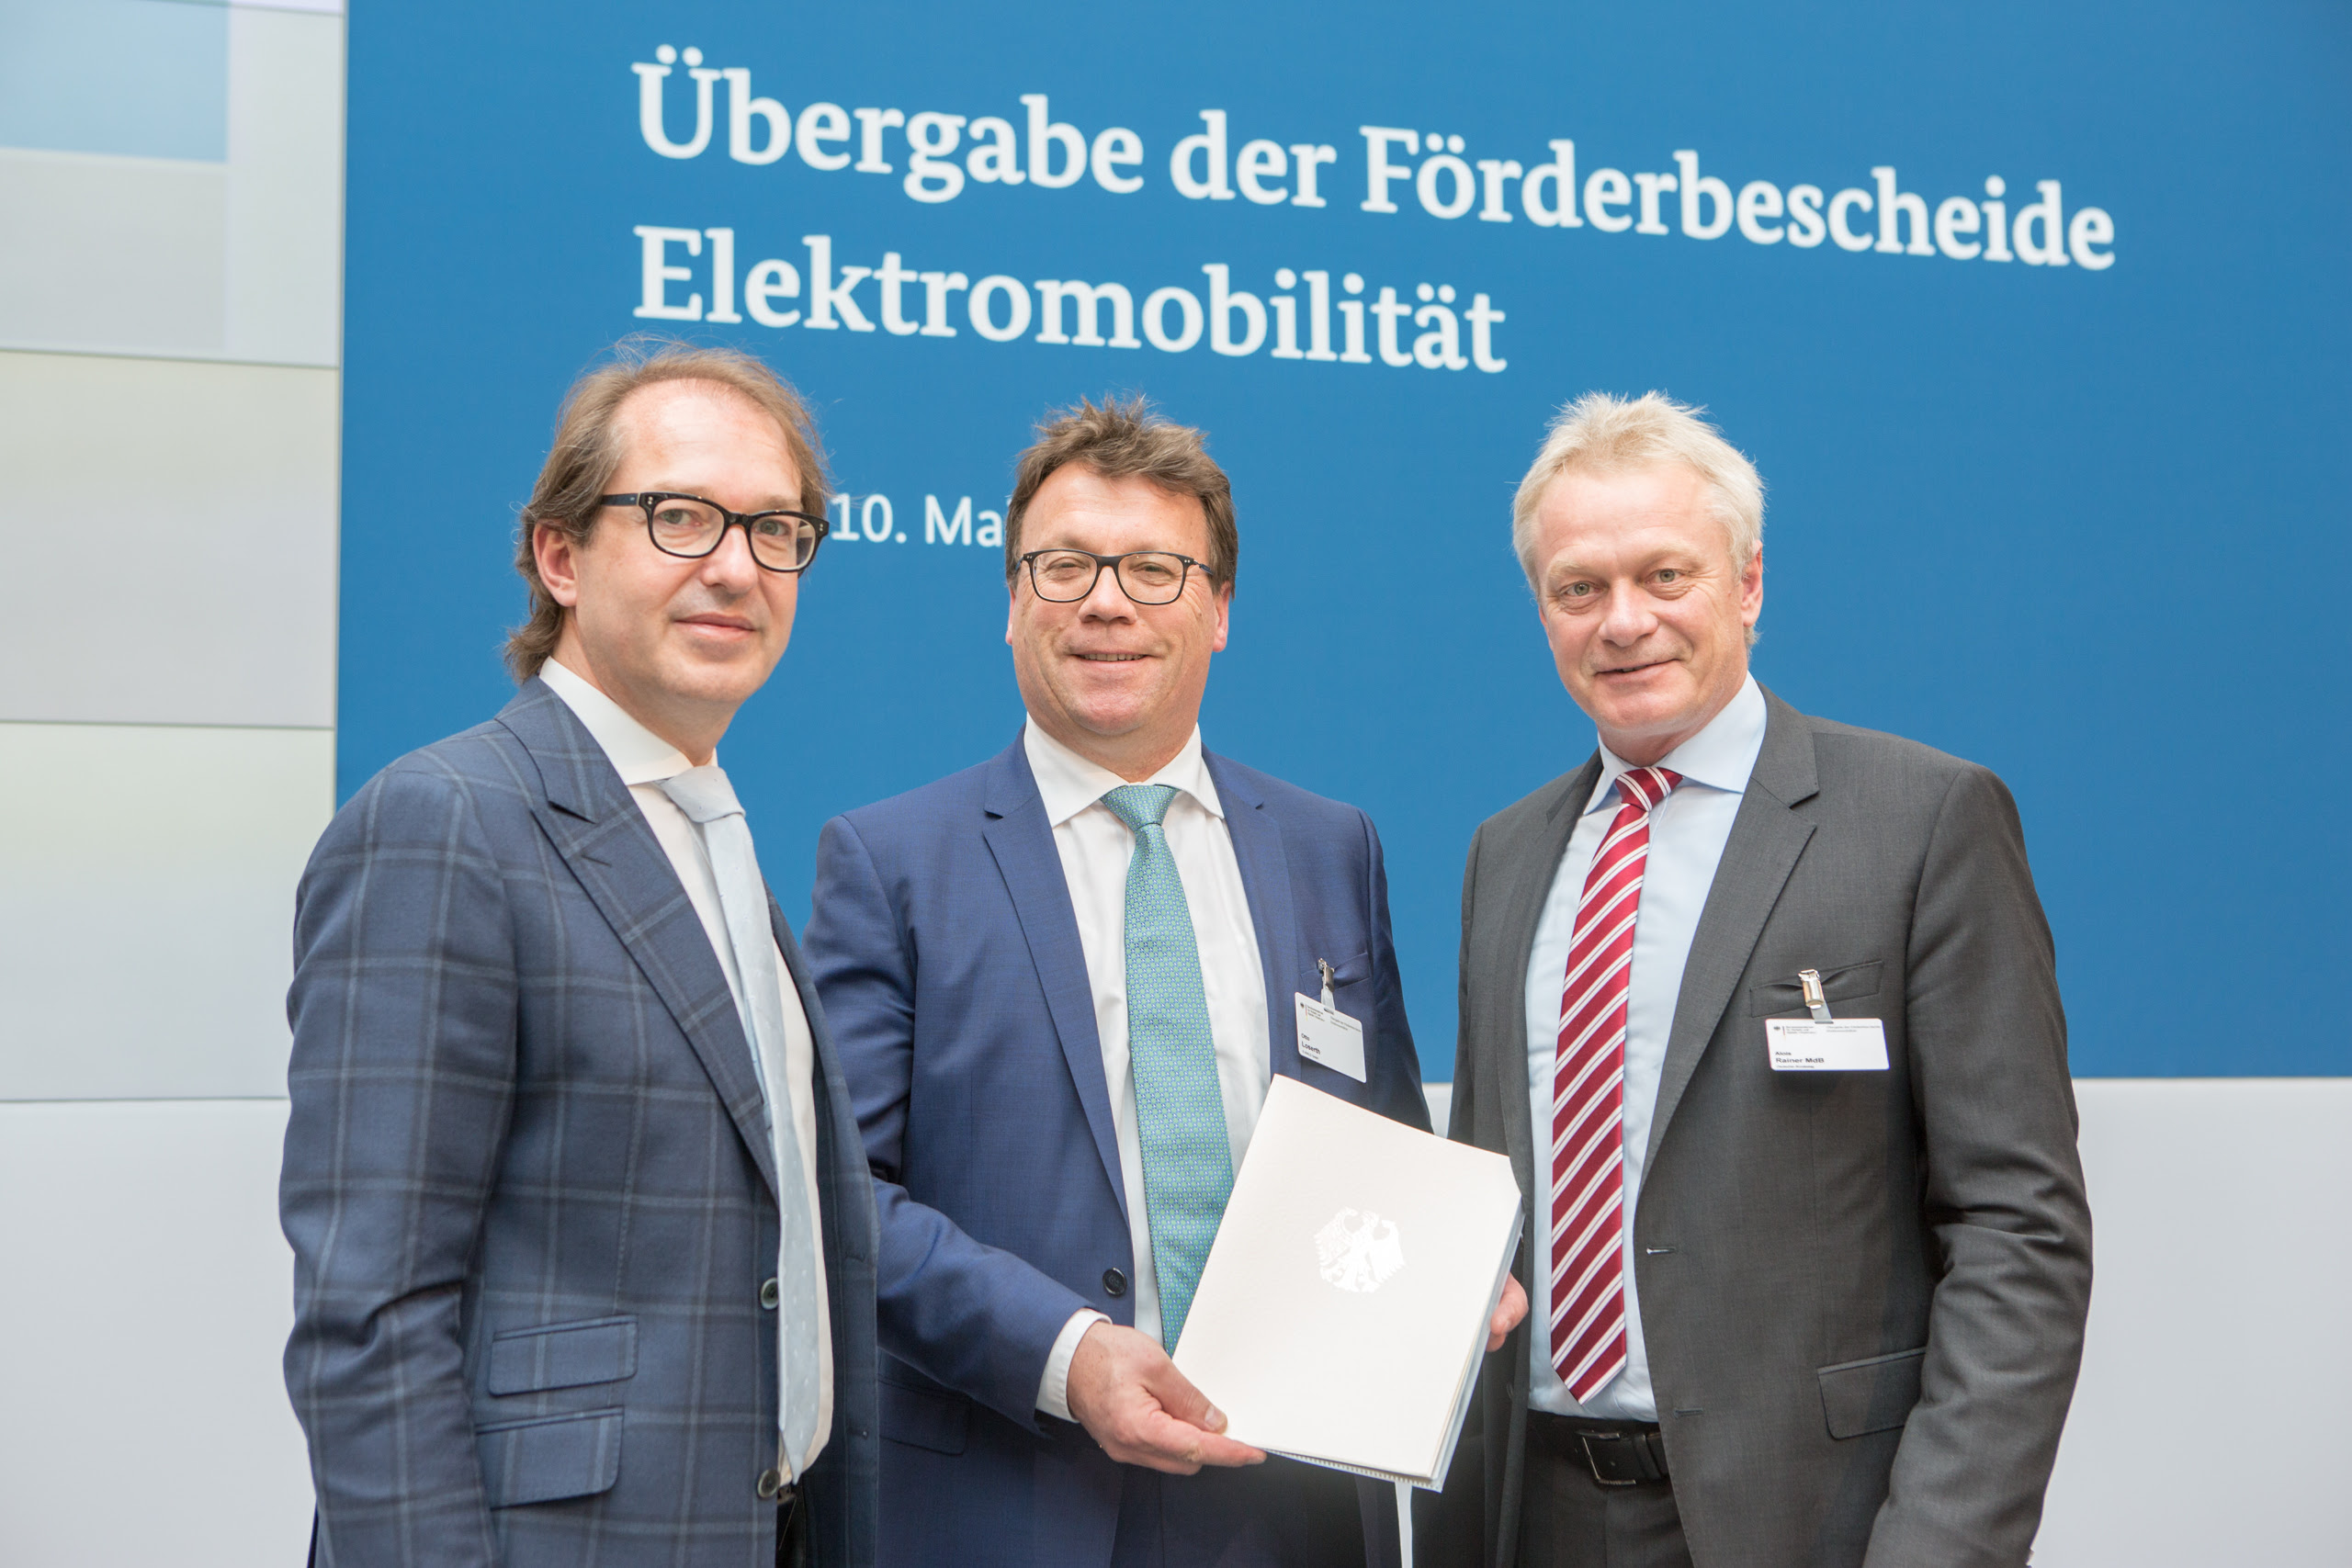 Bundesminister A. Dobrindt, O. Loserth Geschäftsführer E-WALD, Bundestagsabgeordneter A. Rainer (CSU)